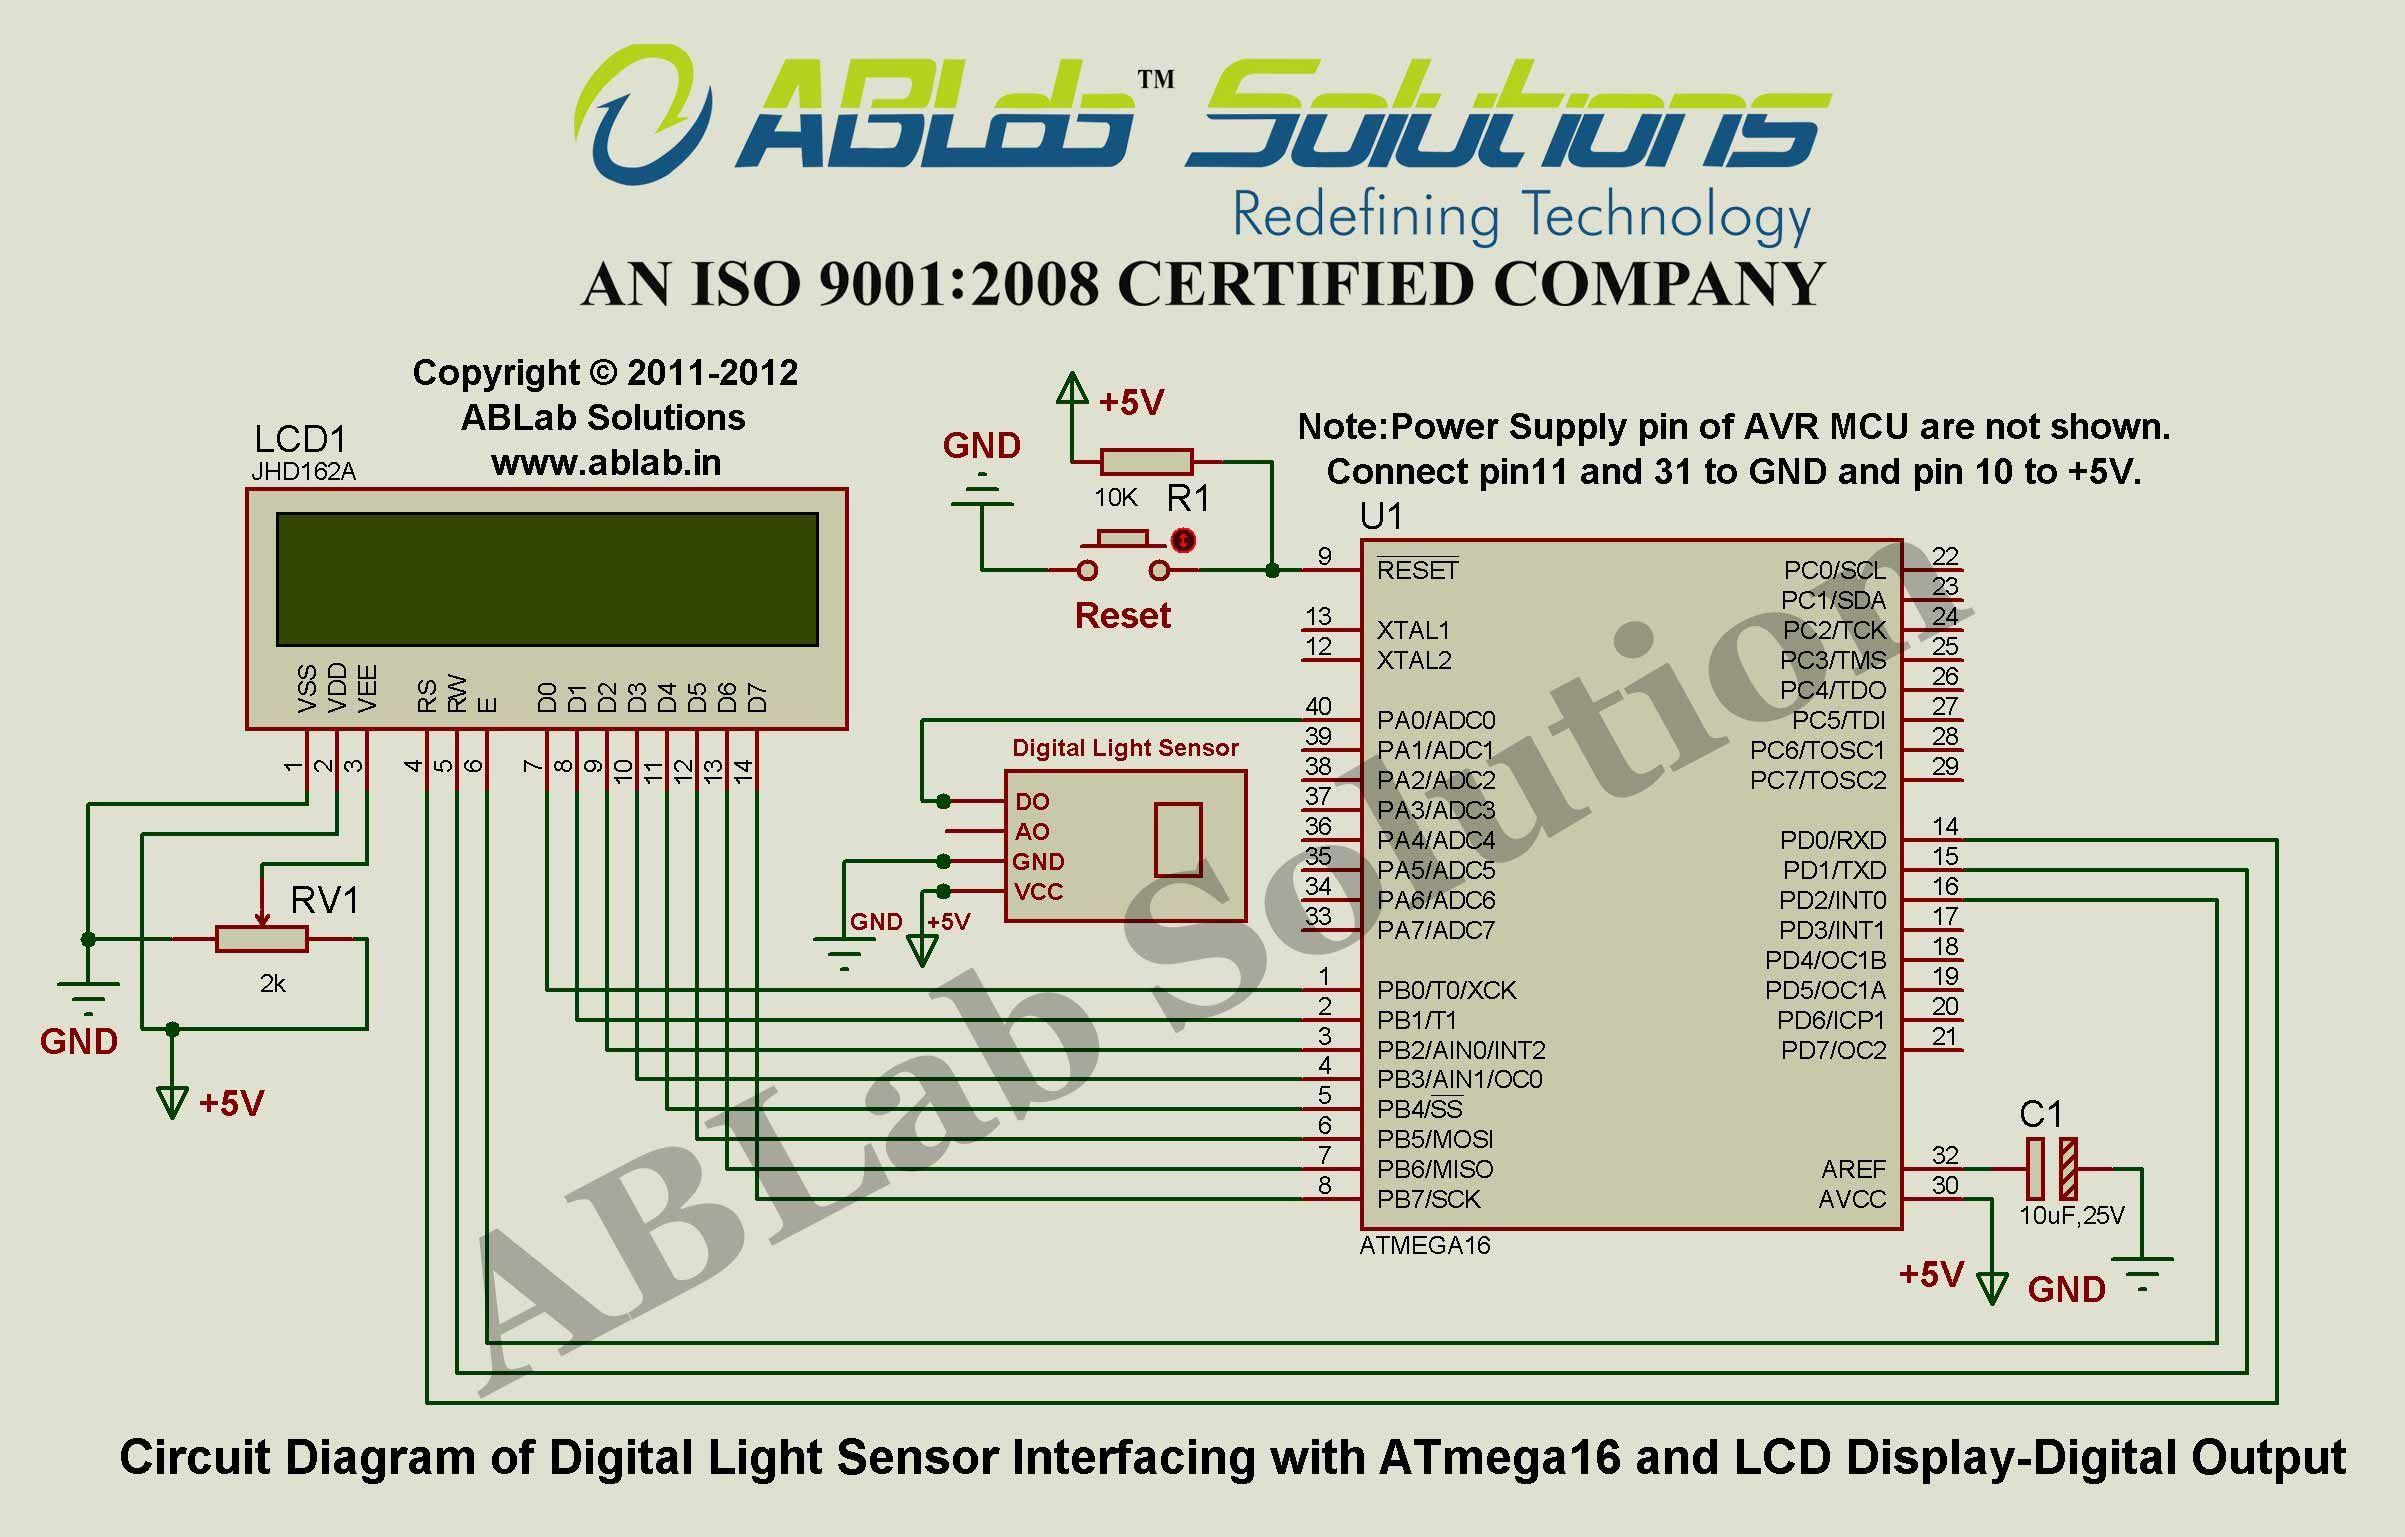 Digital-Light-Sensor-Interfacing-with-AVR ATmega16 Microcontroller ...